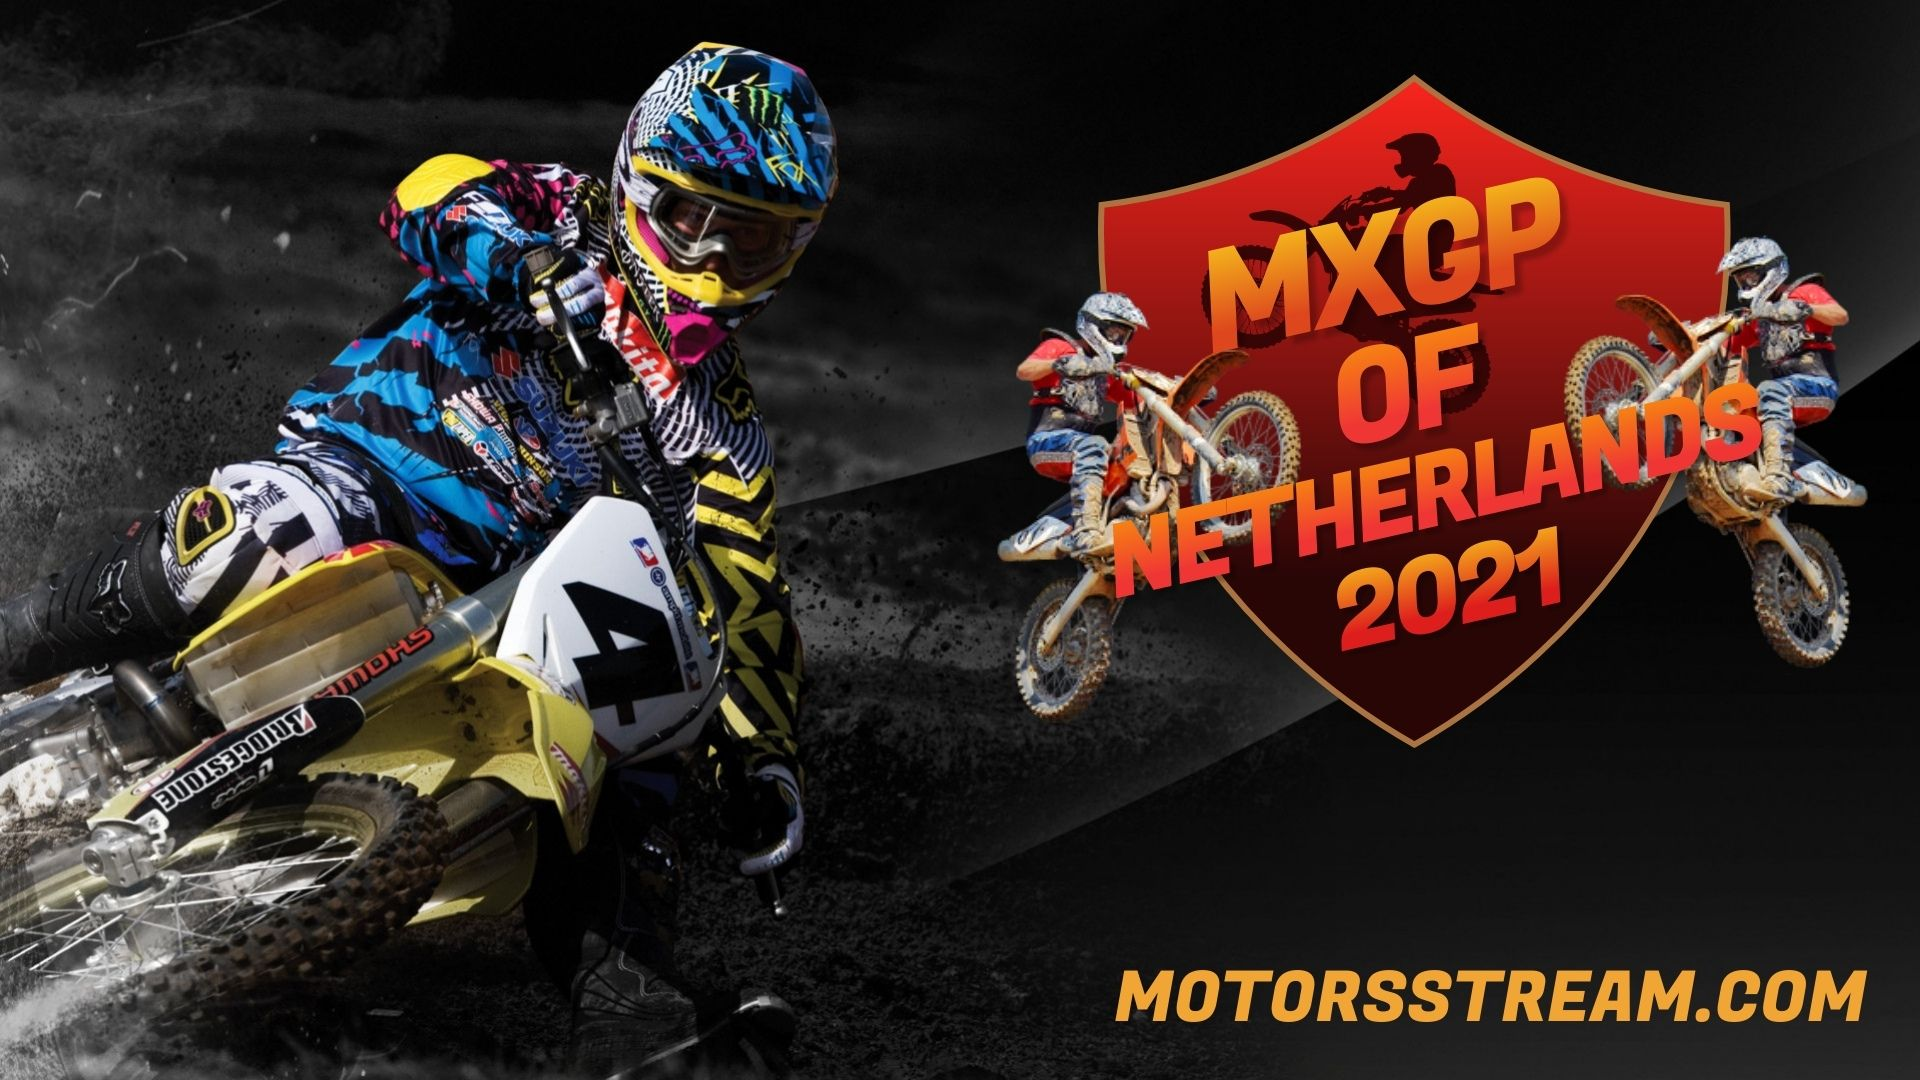 FIM Motocross WC The Netherlands Live Stream 2021 | MXGP